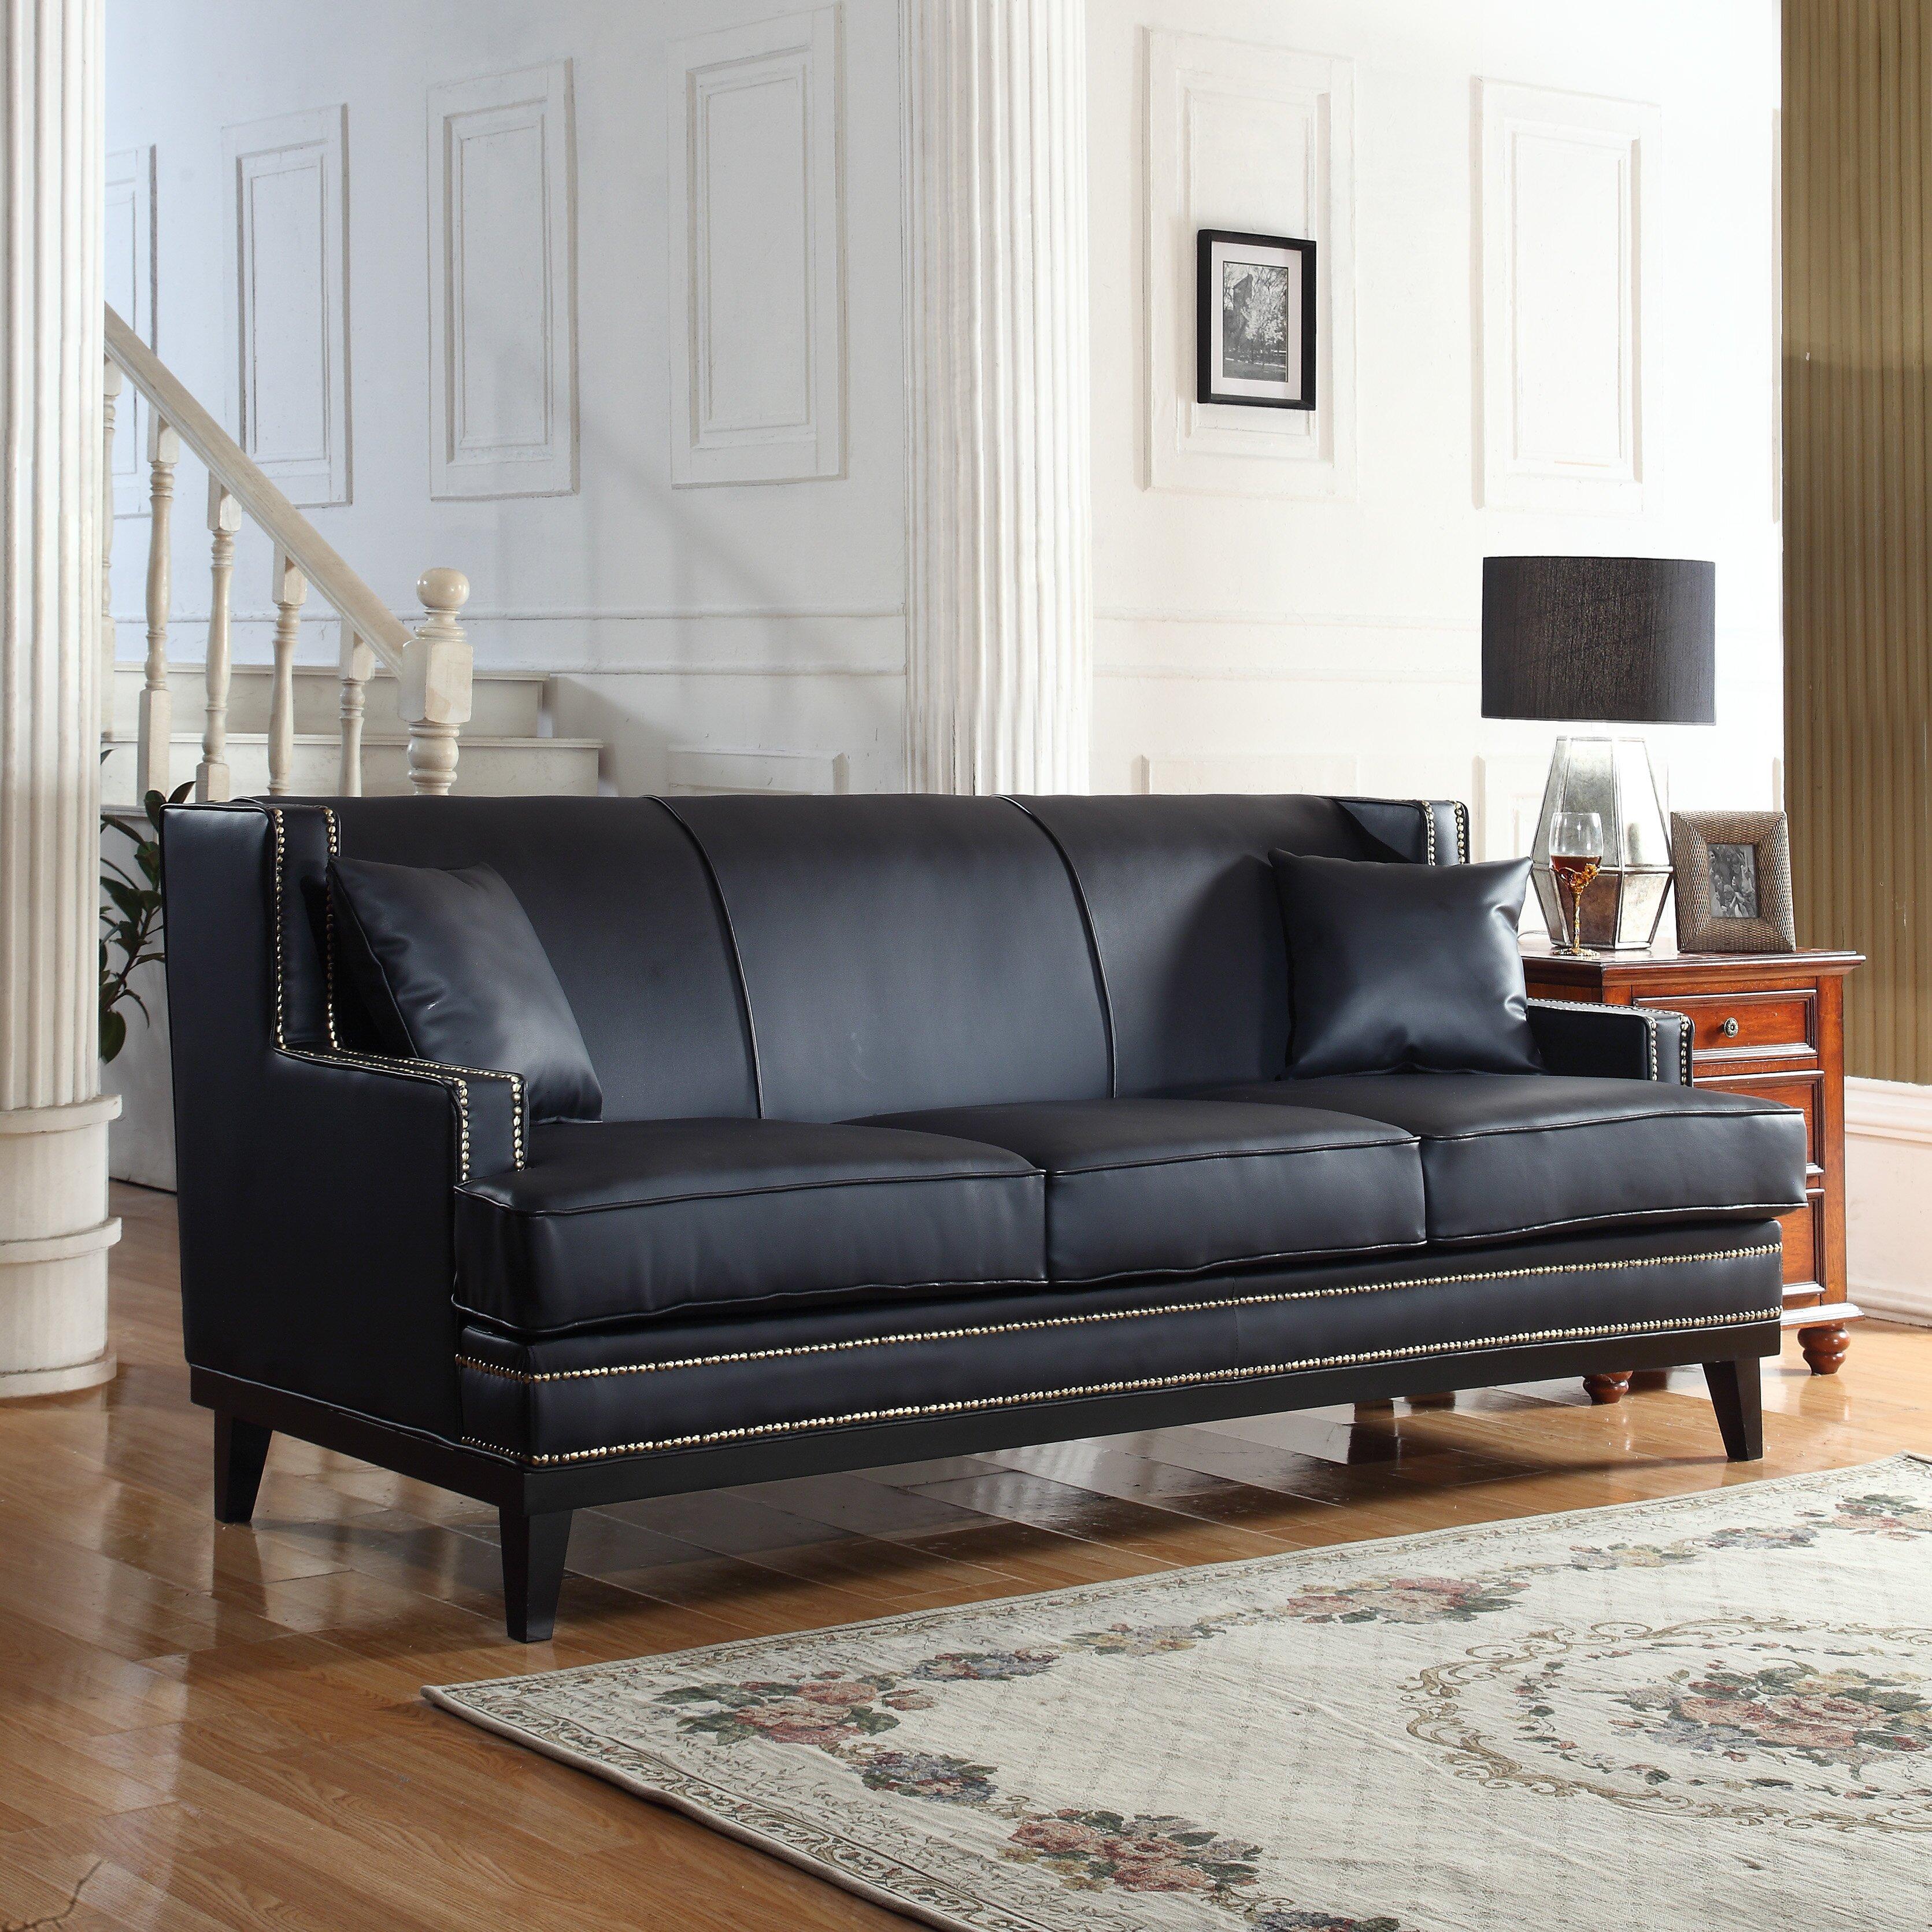 Modern Nailhead Sofa: Madison Home USA Sofa